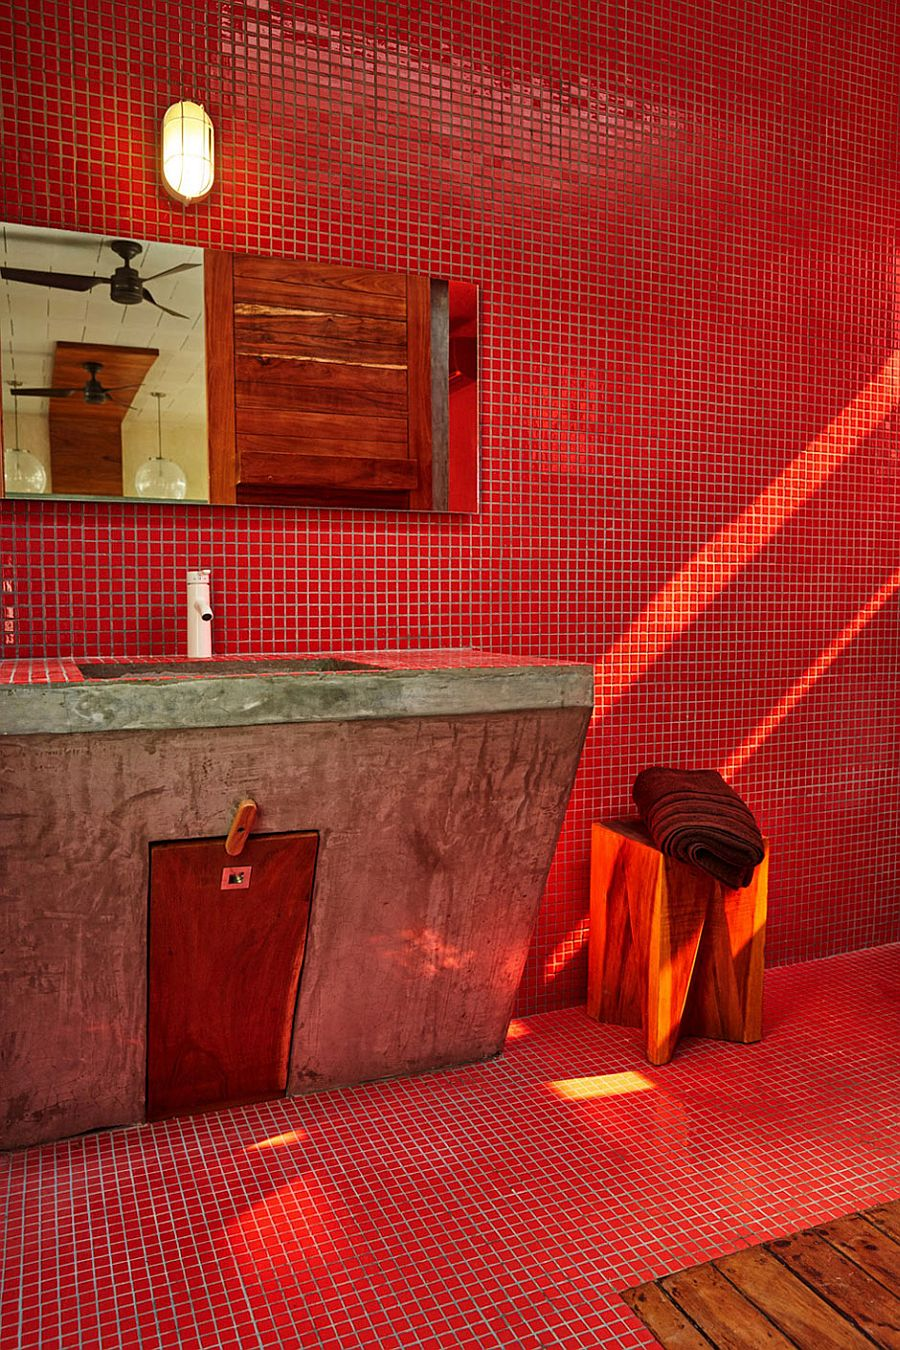 Bathroom vanity in polished concrete